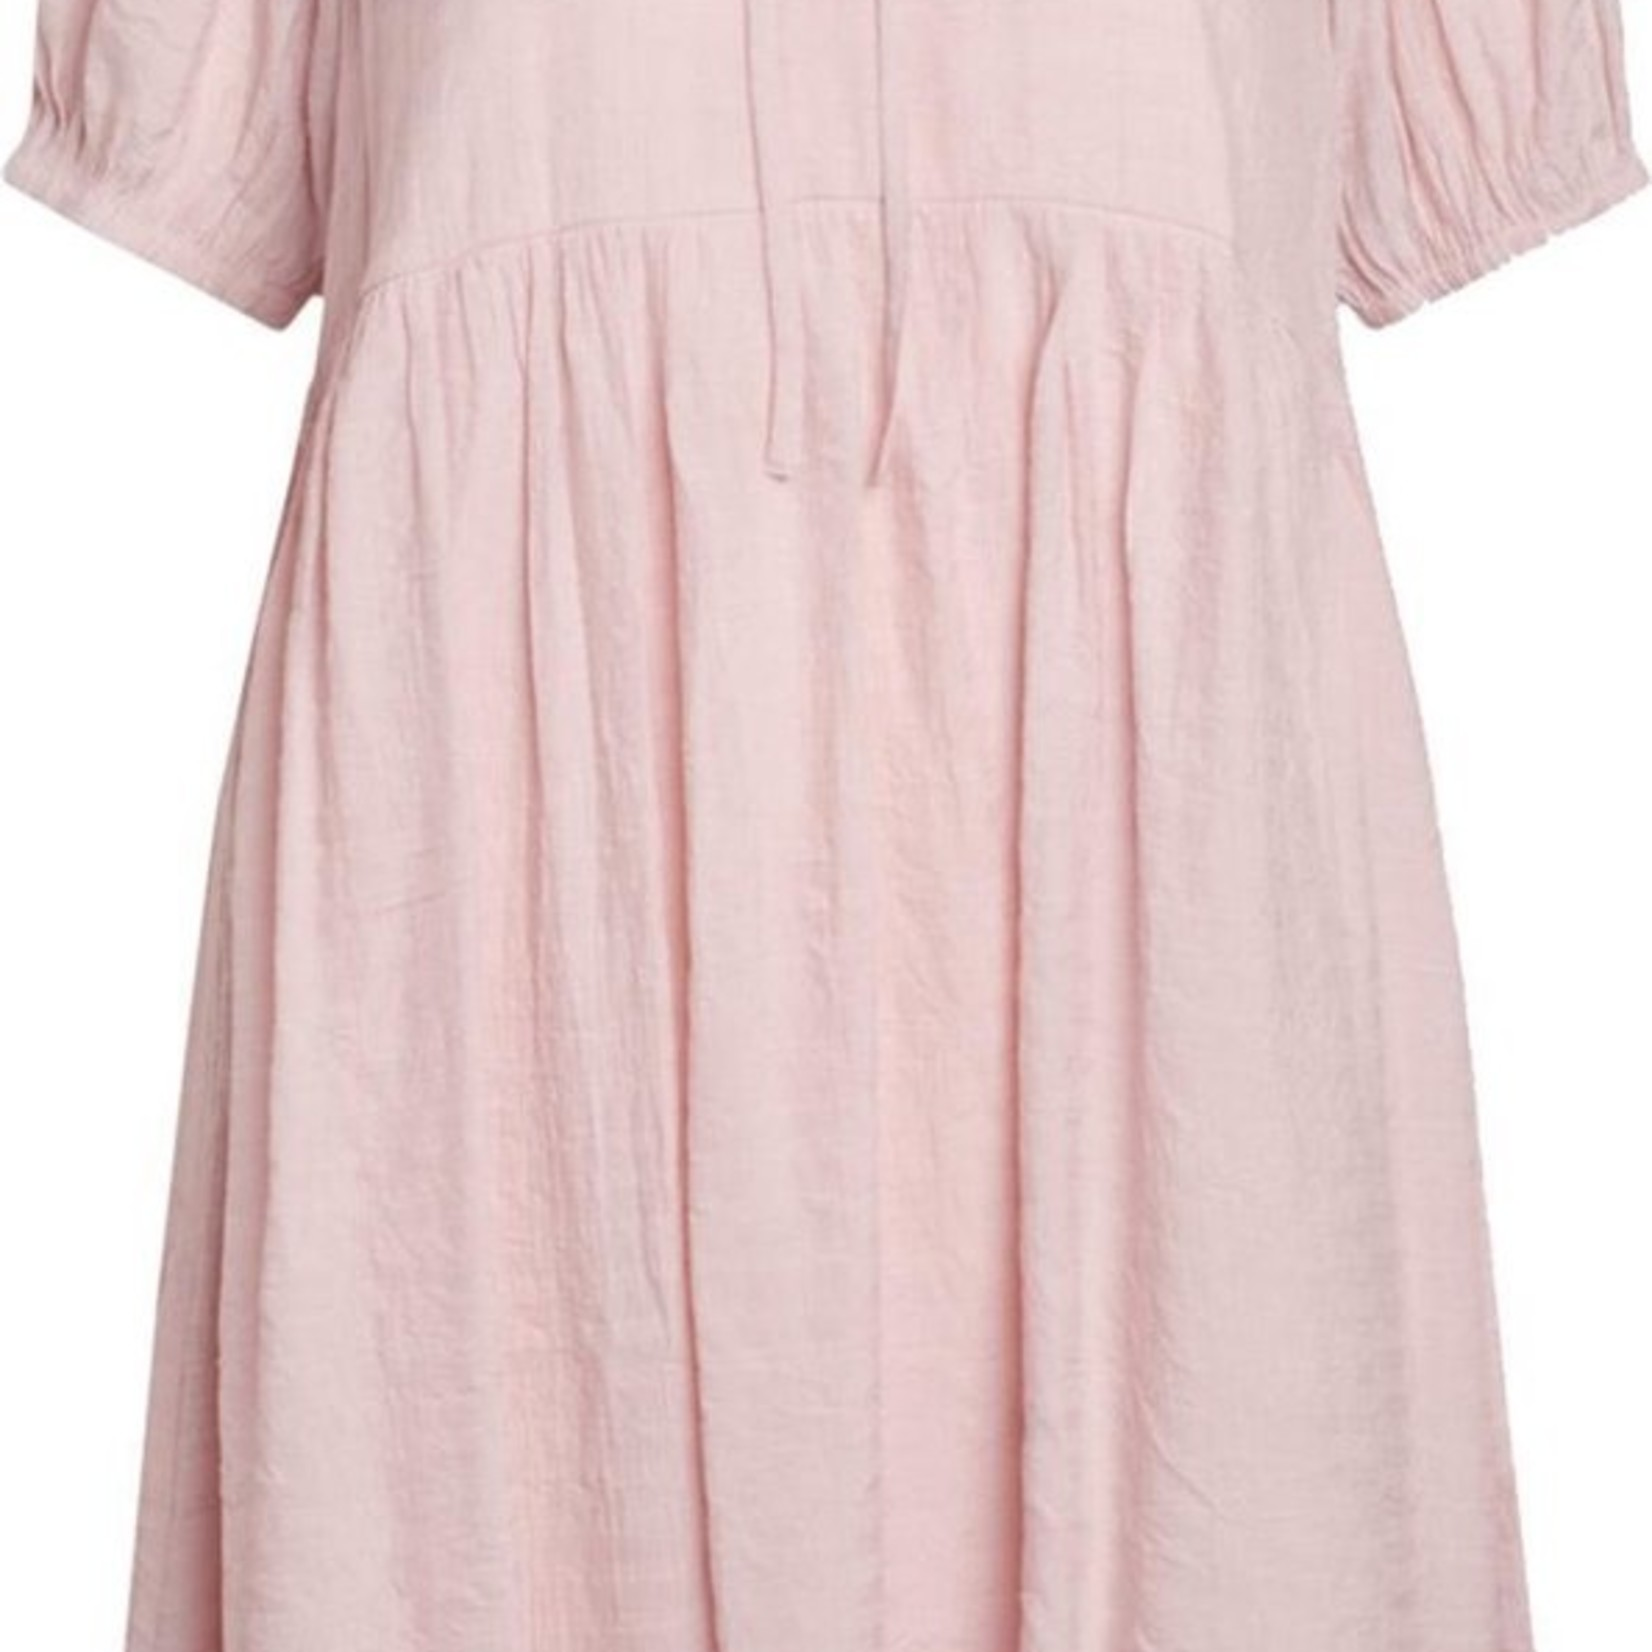 SISTERSPOINT ECA DRESS, wijd vallende jurk